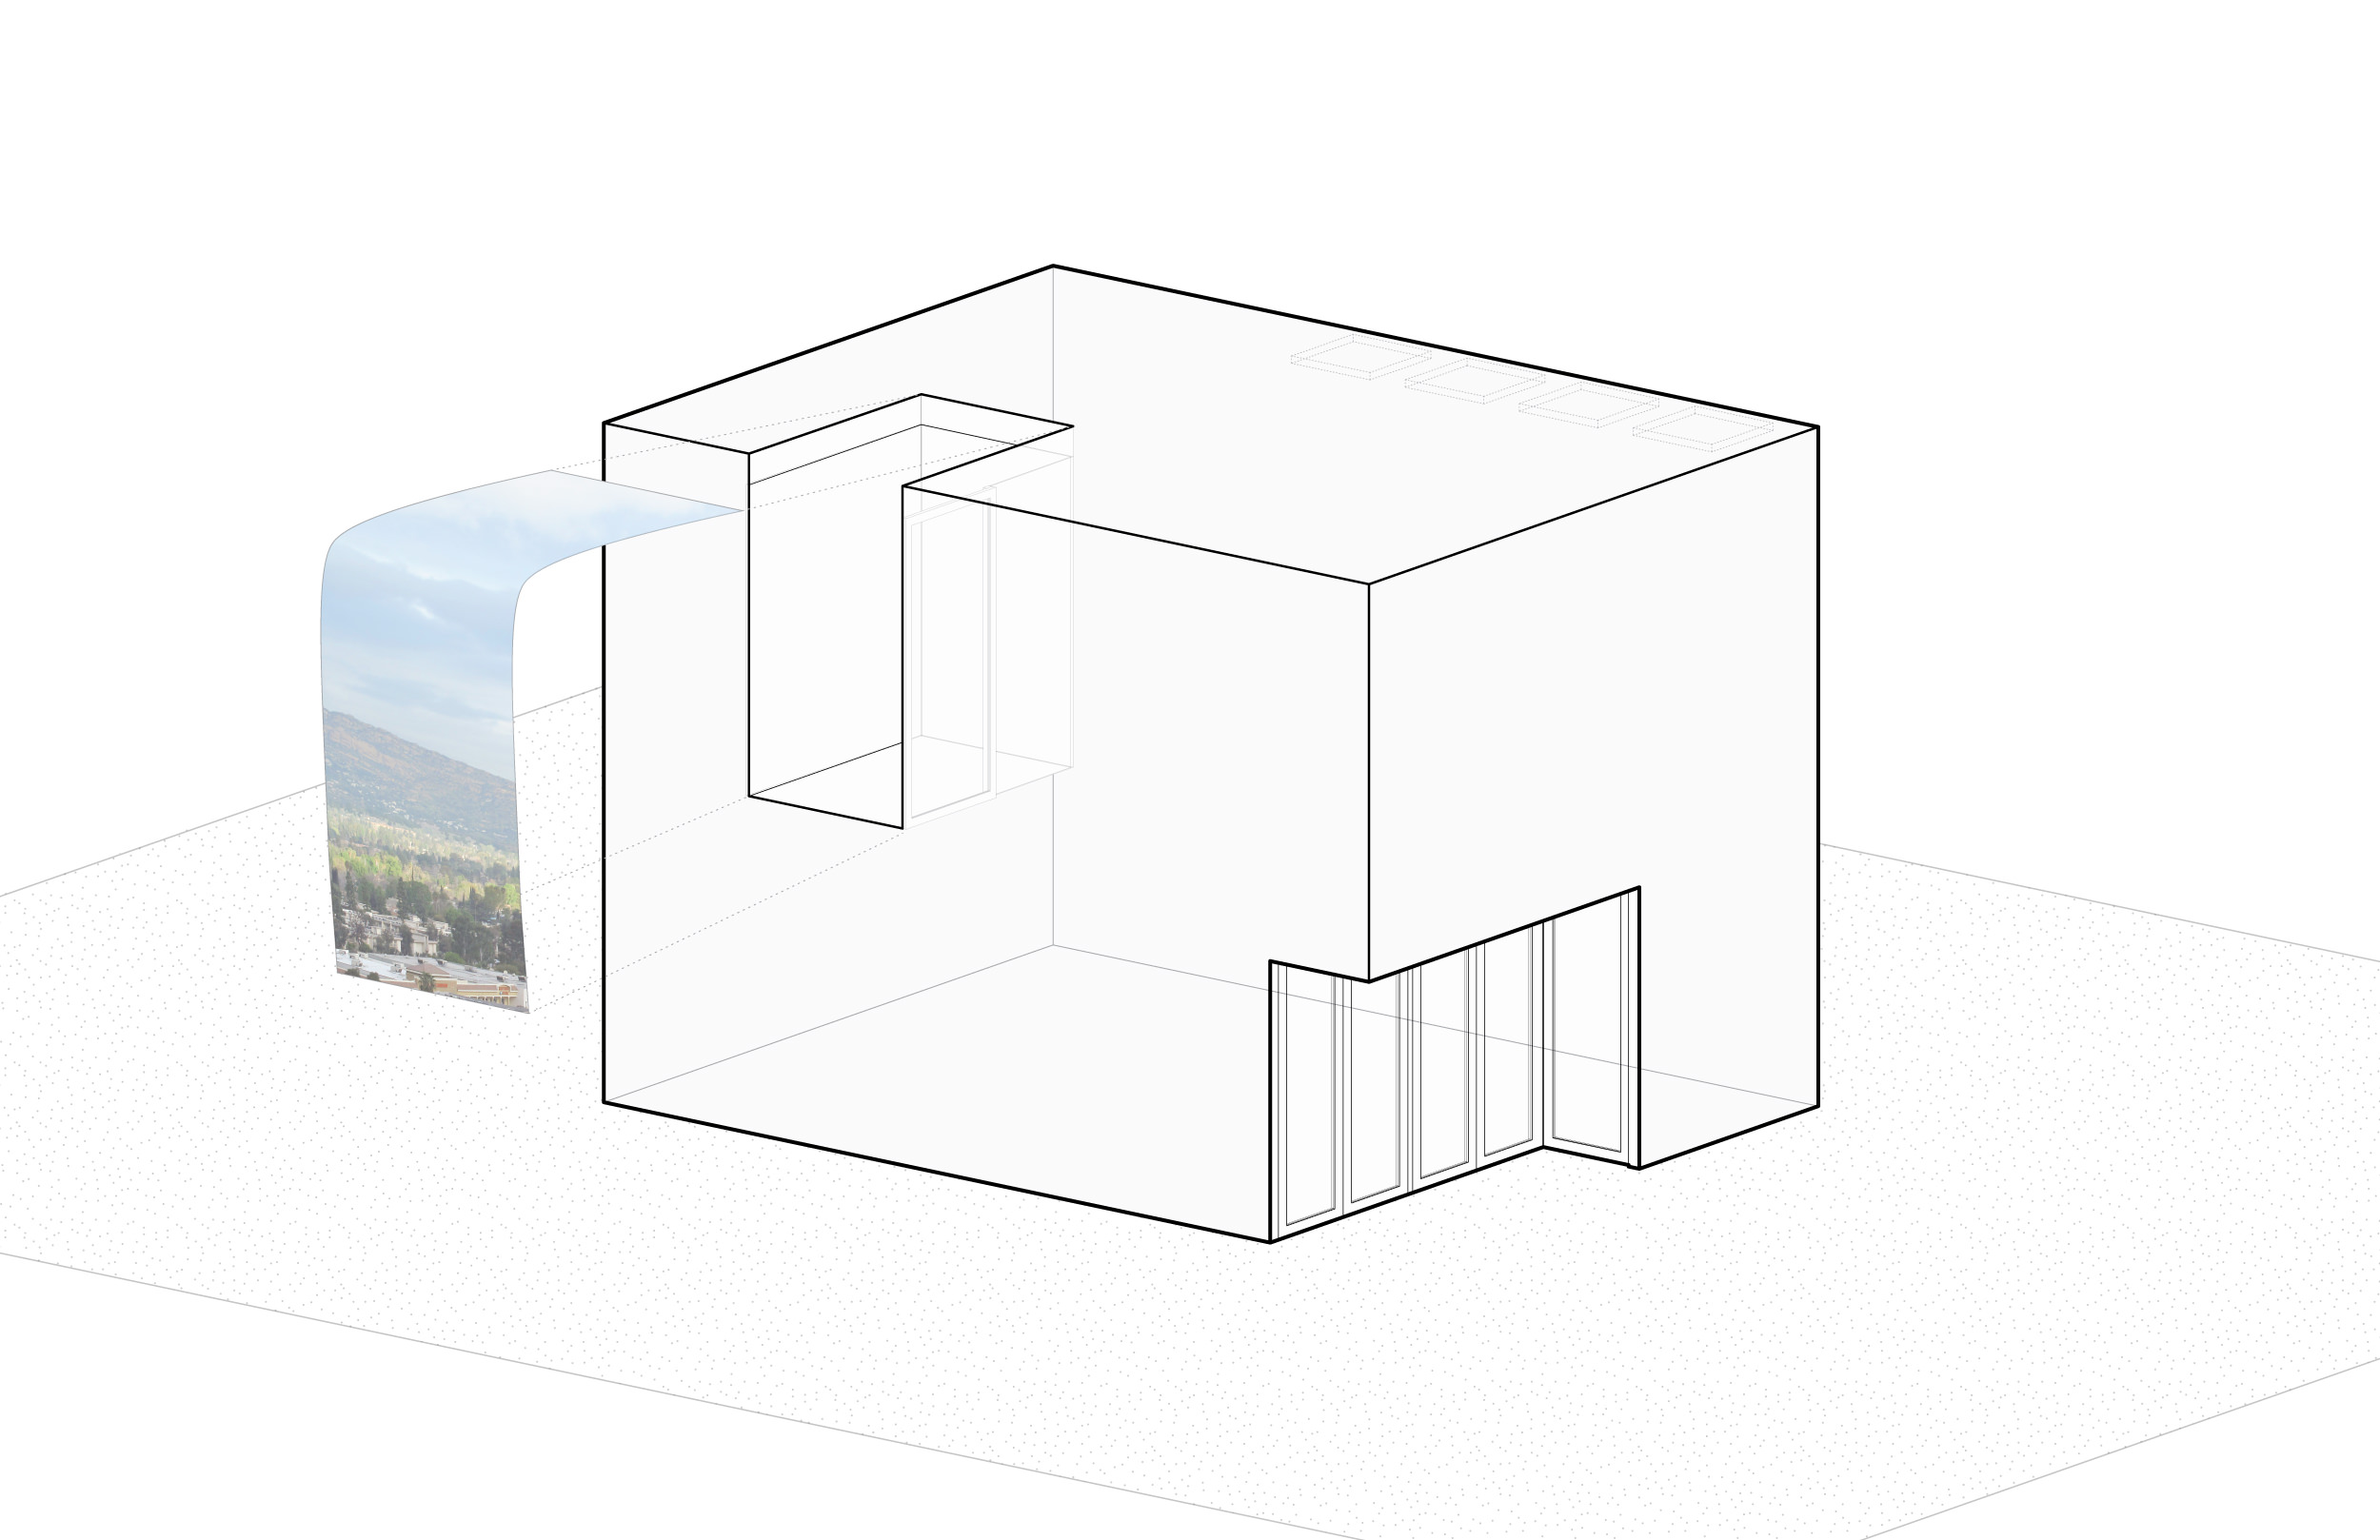 Studio-City-House_Diagram_03.jpg